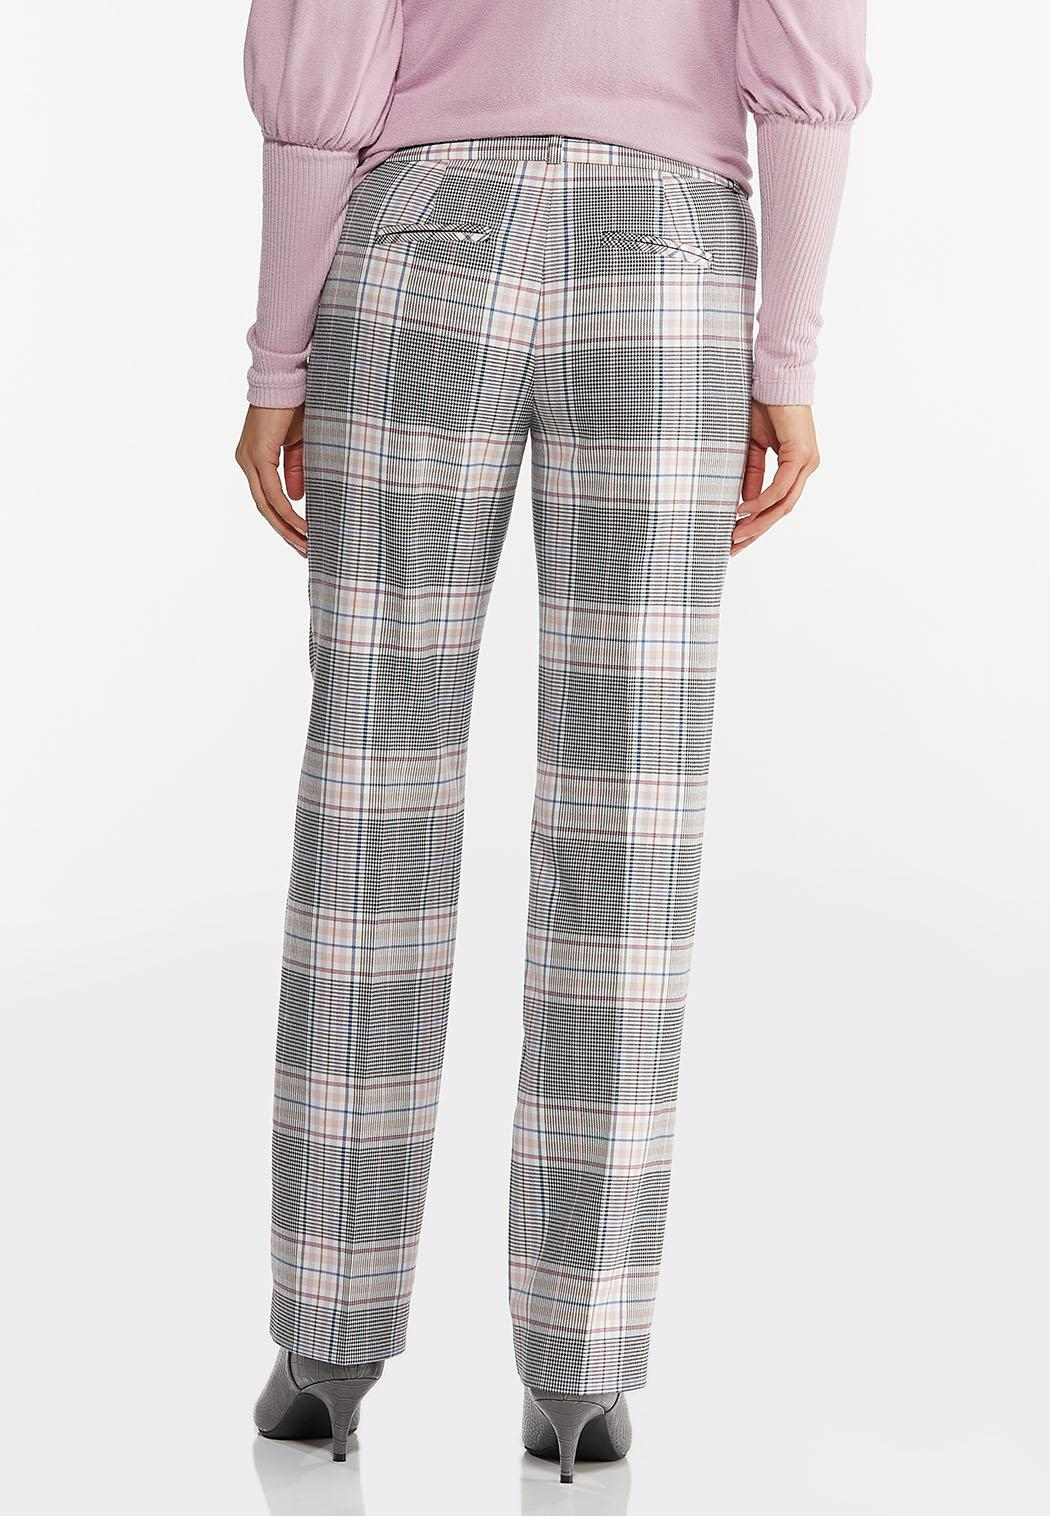 Petite Lavender Plaid Trouser Pants (Item #44475476)